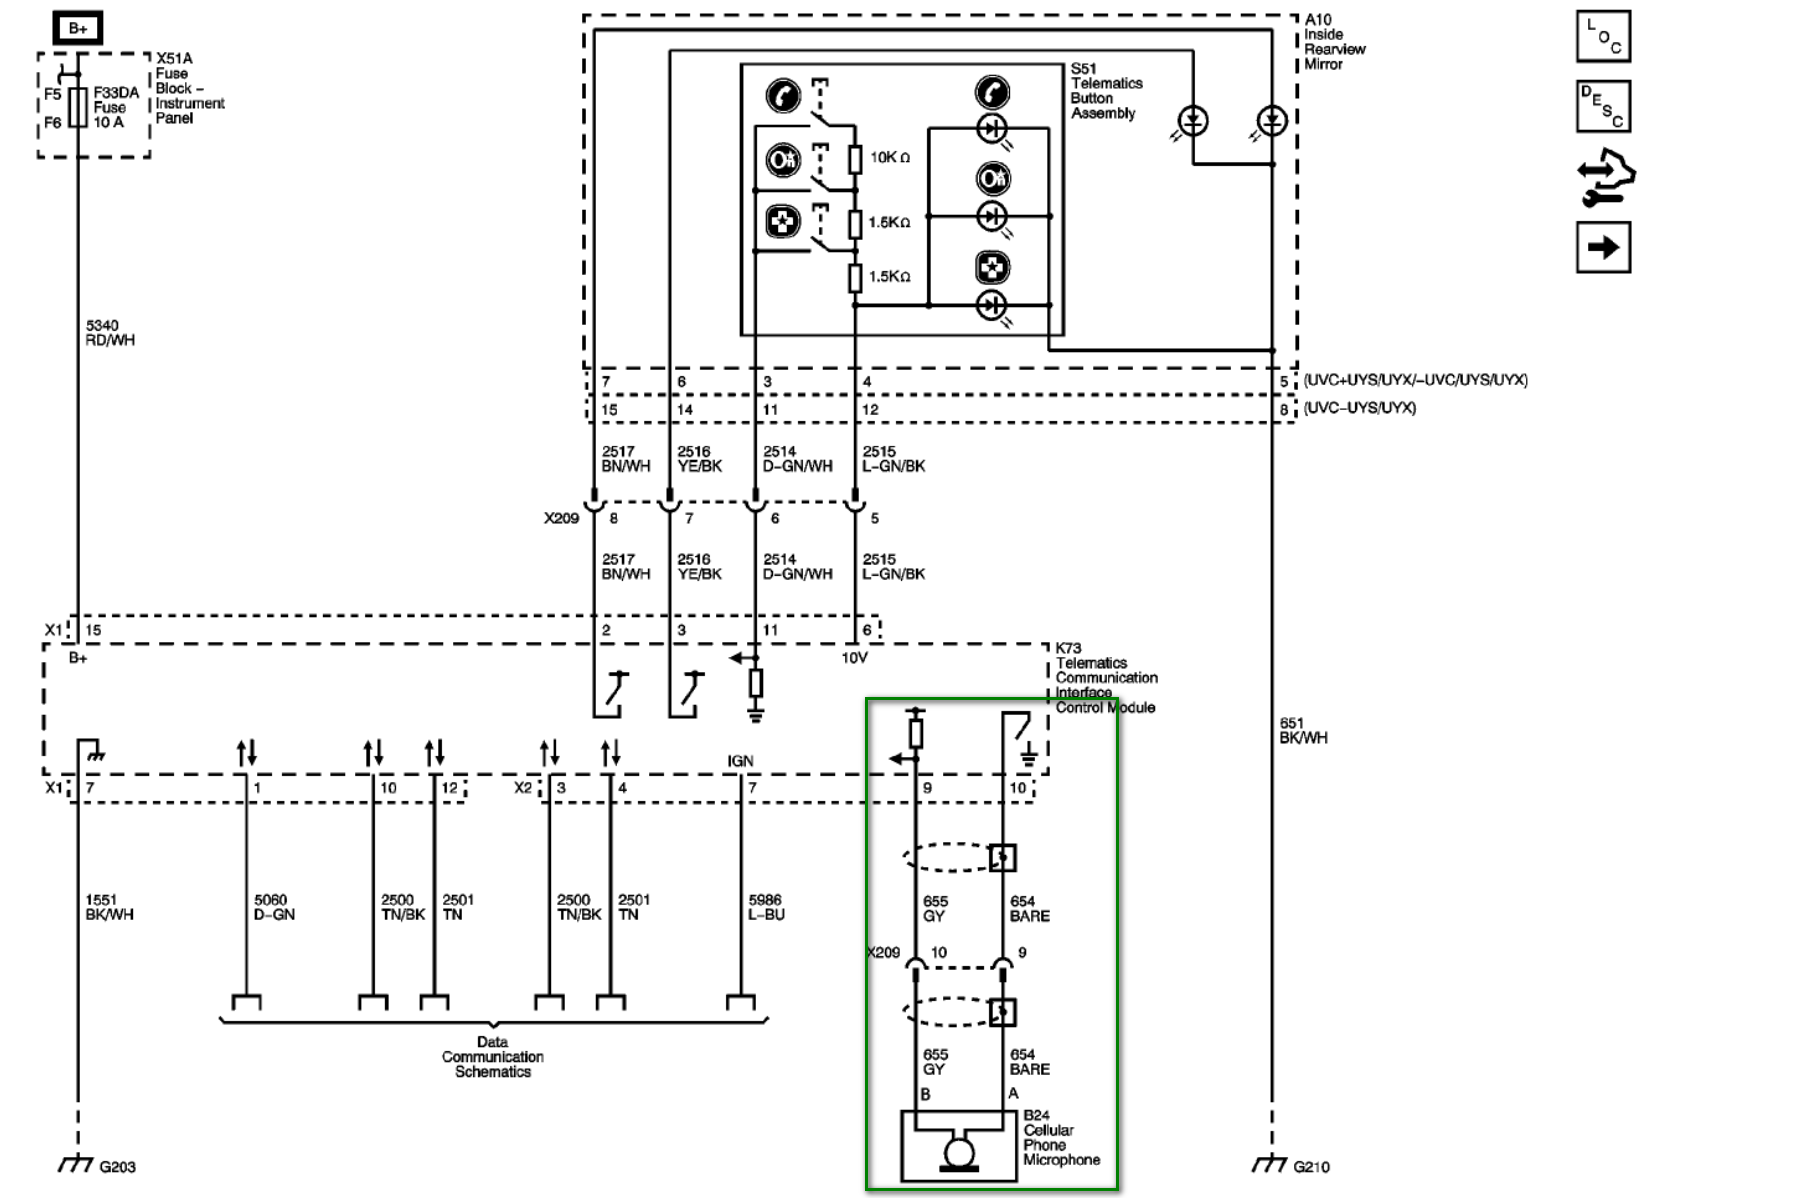 [TVPR_3874]  VF_4050] Kia Rio 2014 Wiring Diagram Newhairstylesformen2014Com Free Diagram | 2008 Gmc Acadia Radio Wiring Diagram |  | Anal Diog Bocep Mohammedshrine Librar Wiring 101